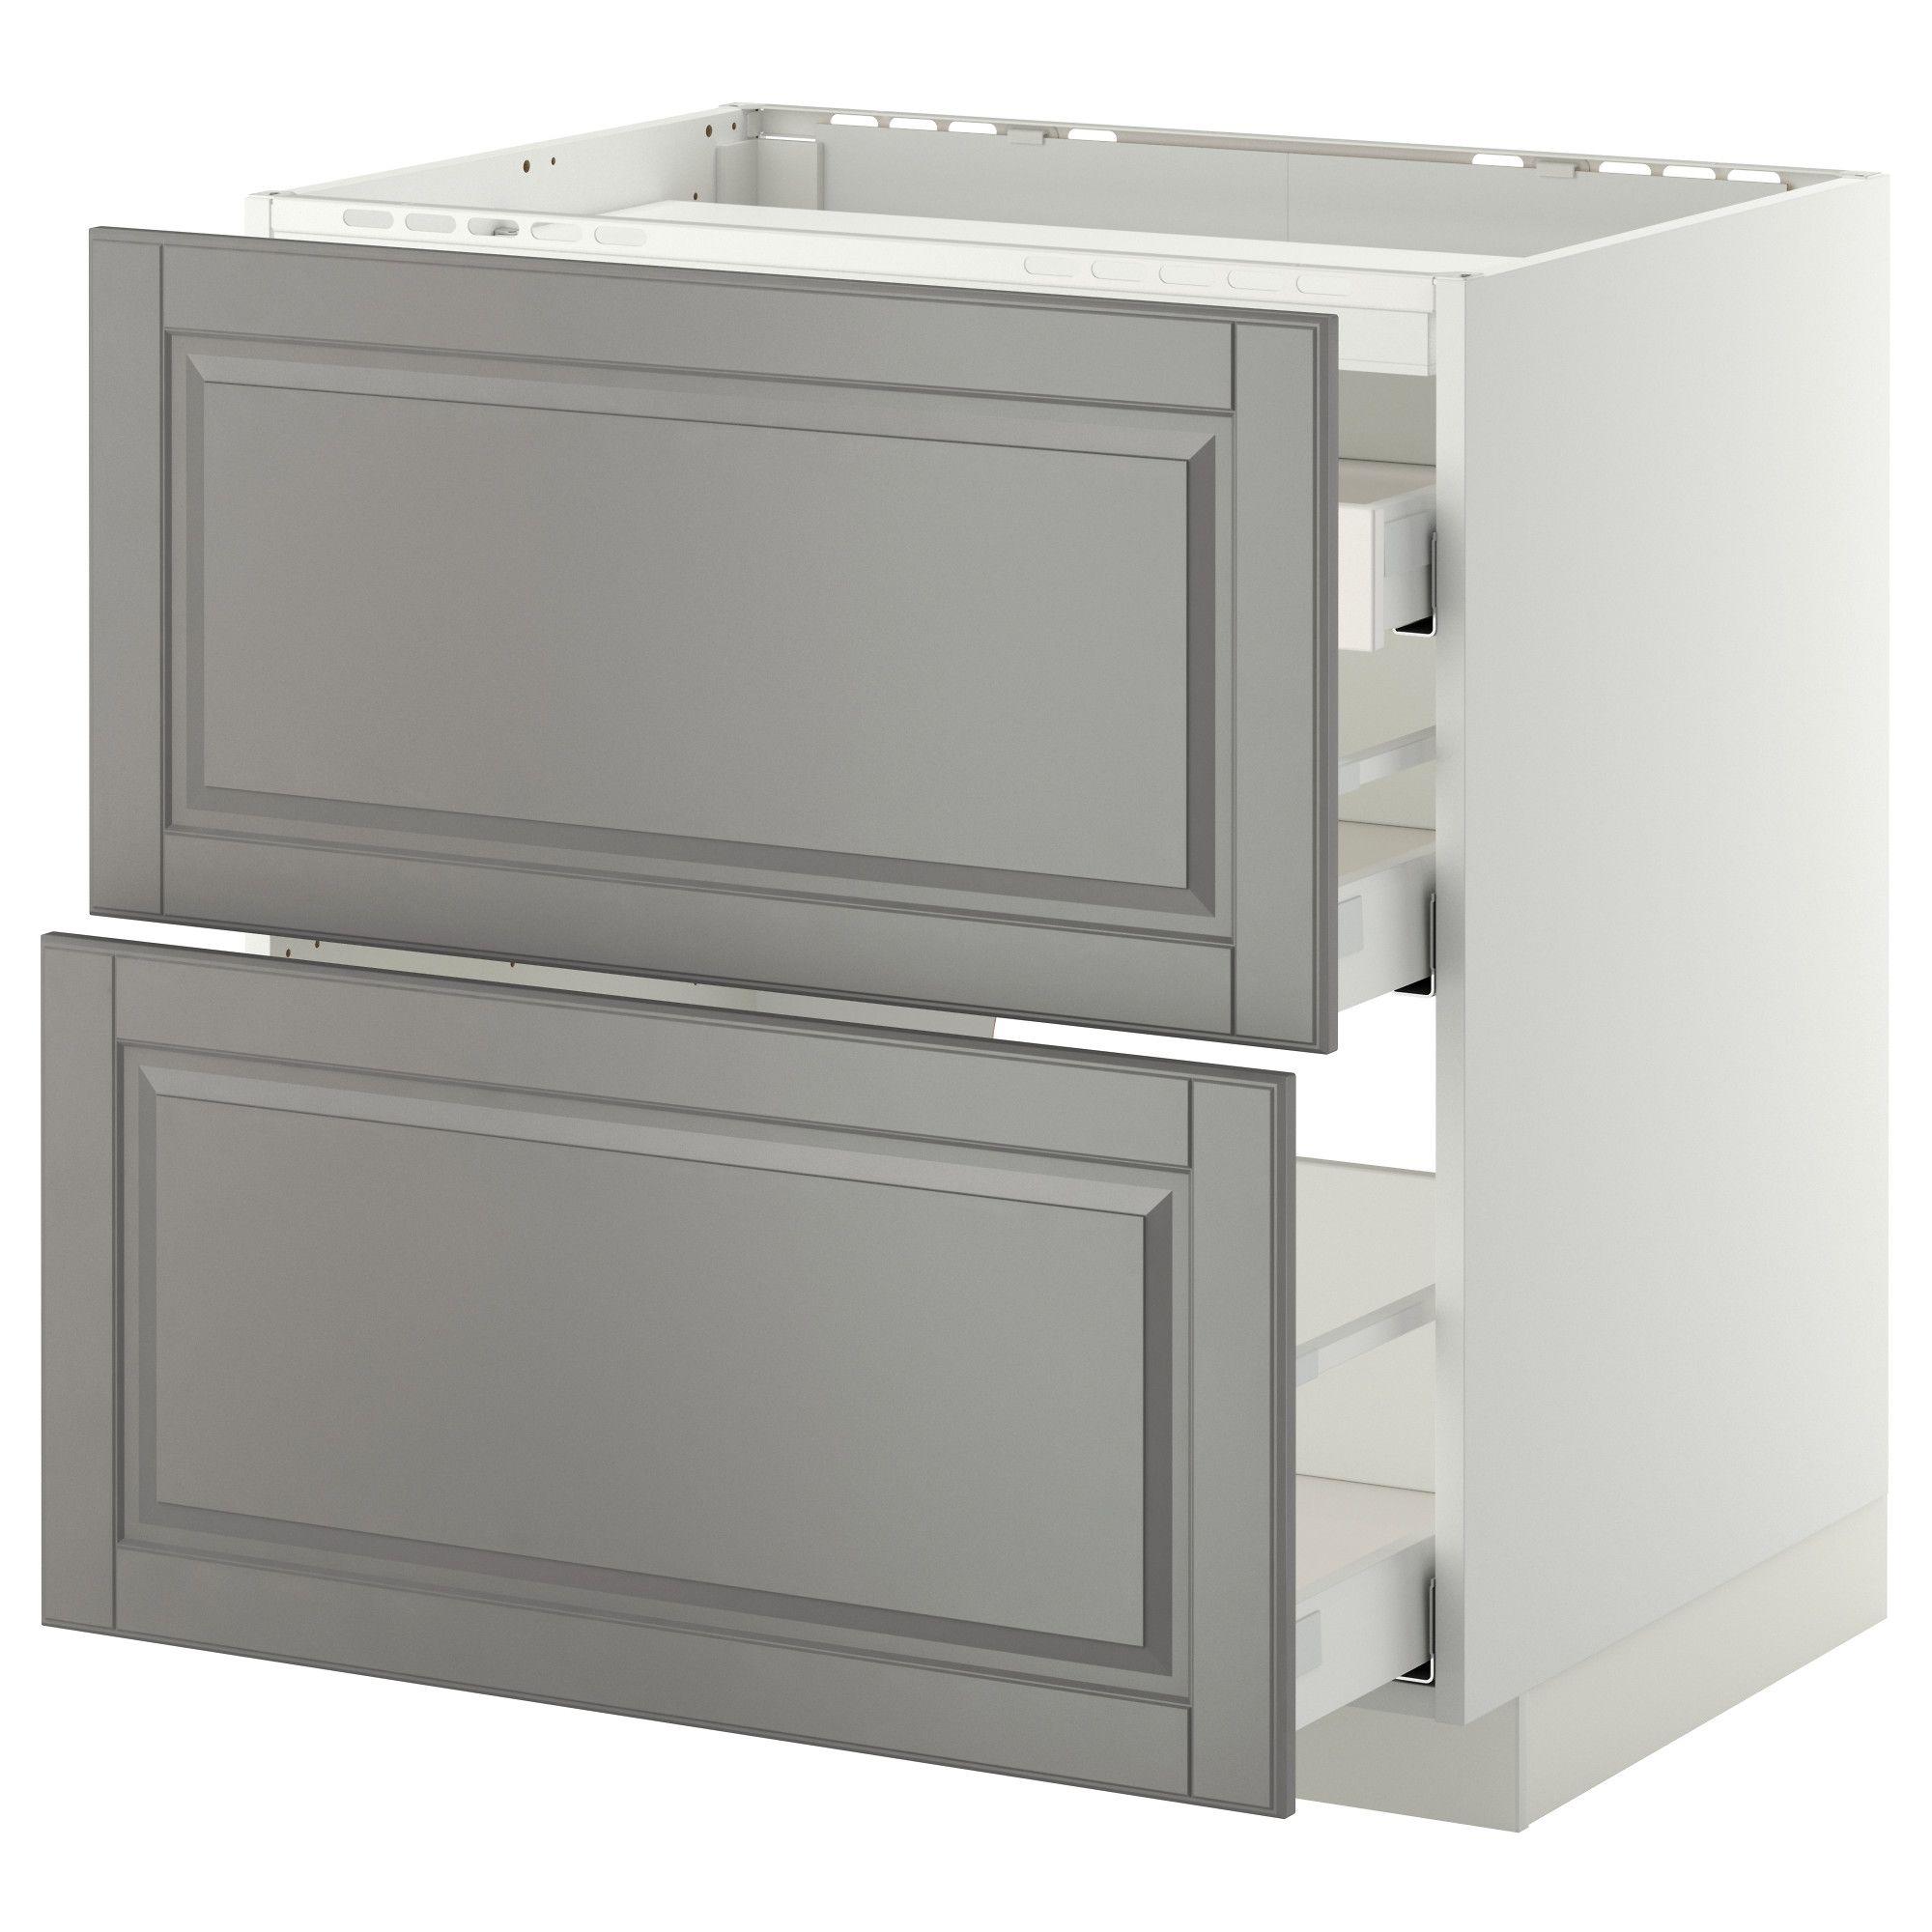 Modular Kitchens Fm 14247 Ikea Drawers Bodbyn Grey